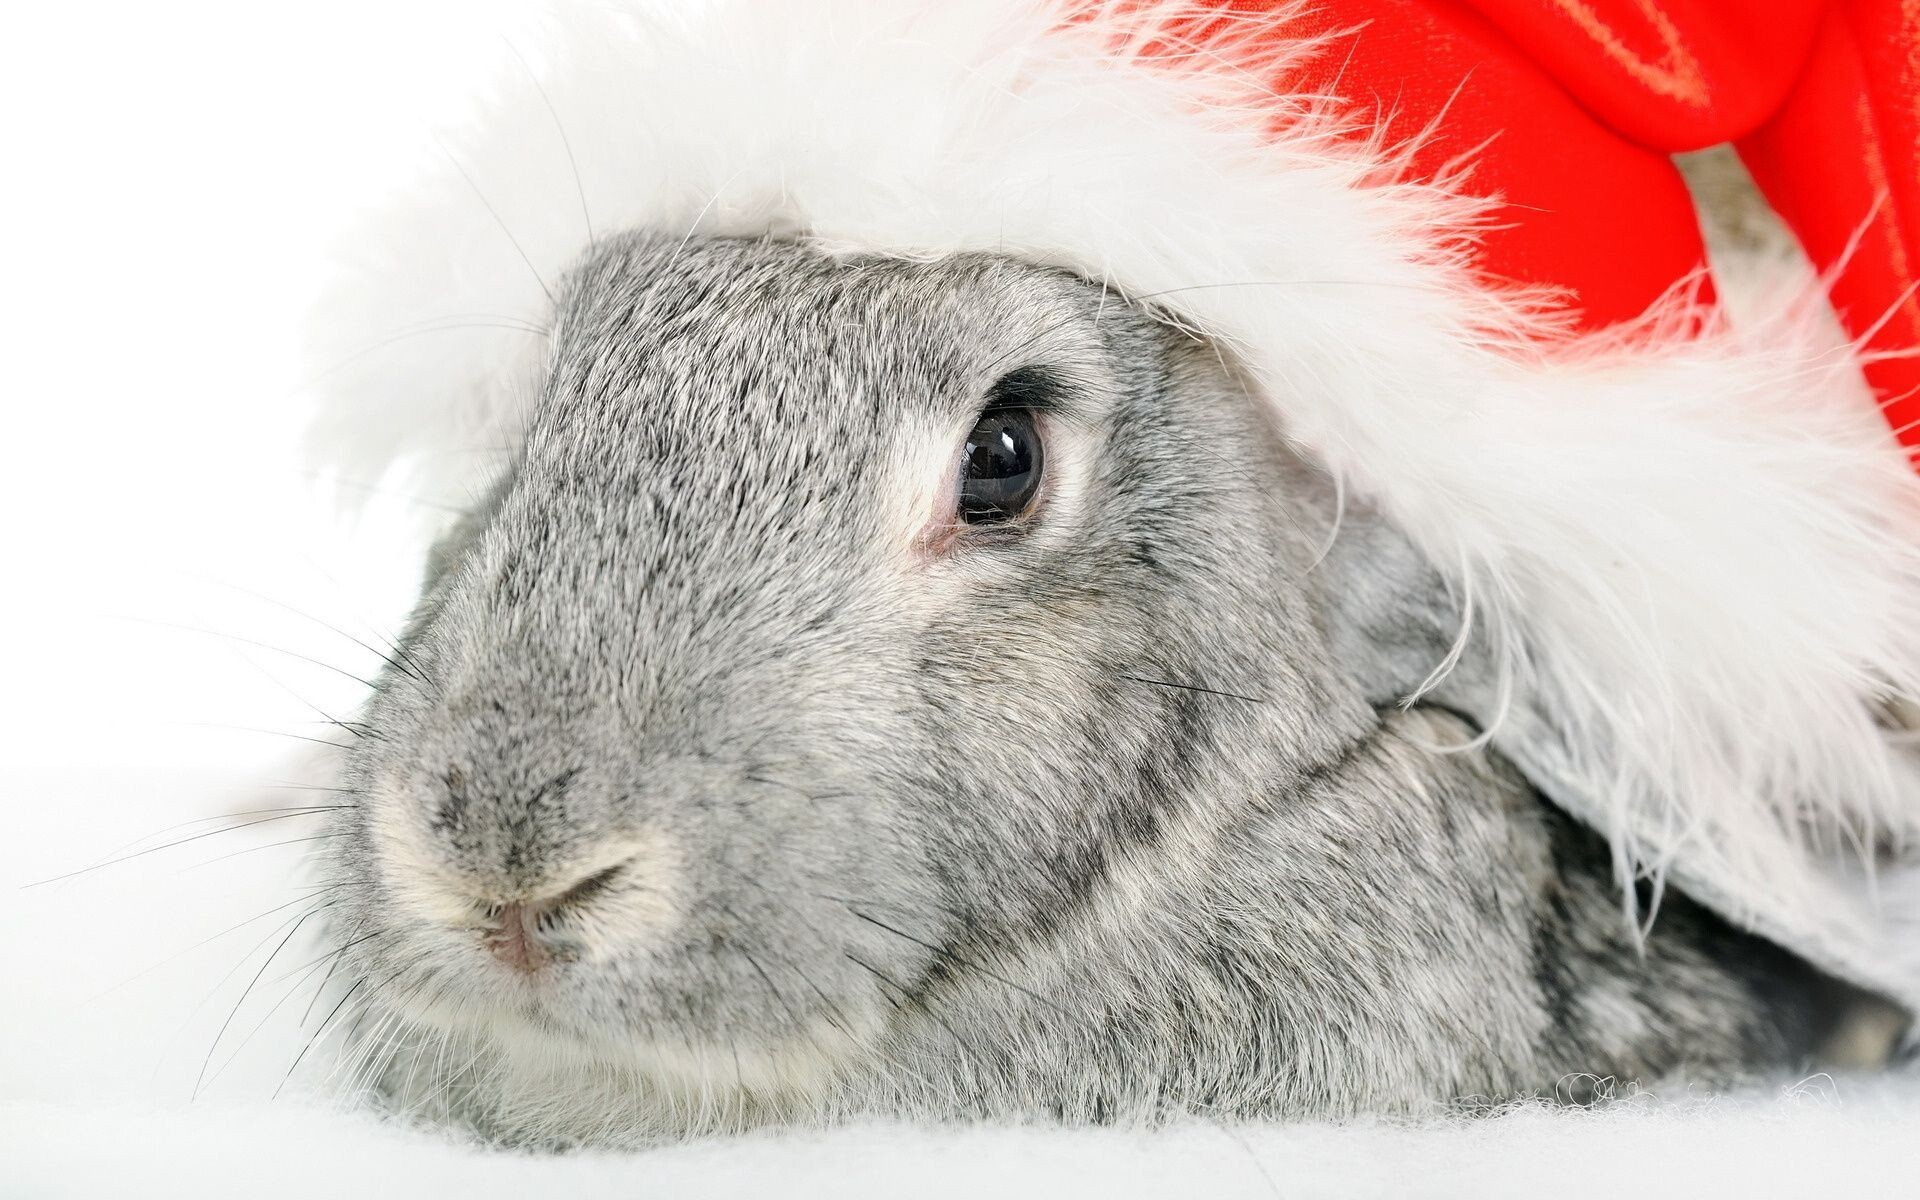 Christmas Rabbit Wallpaper Hd Wallpapers